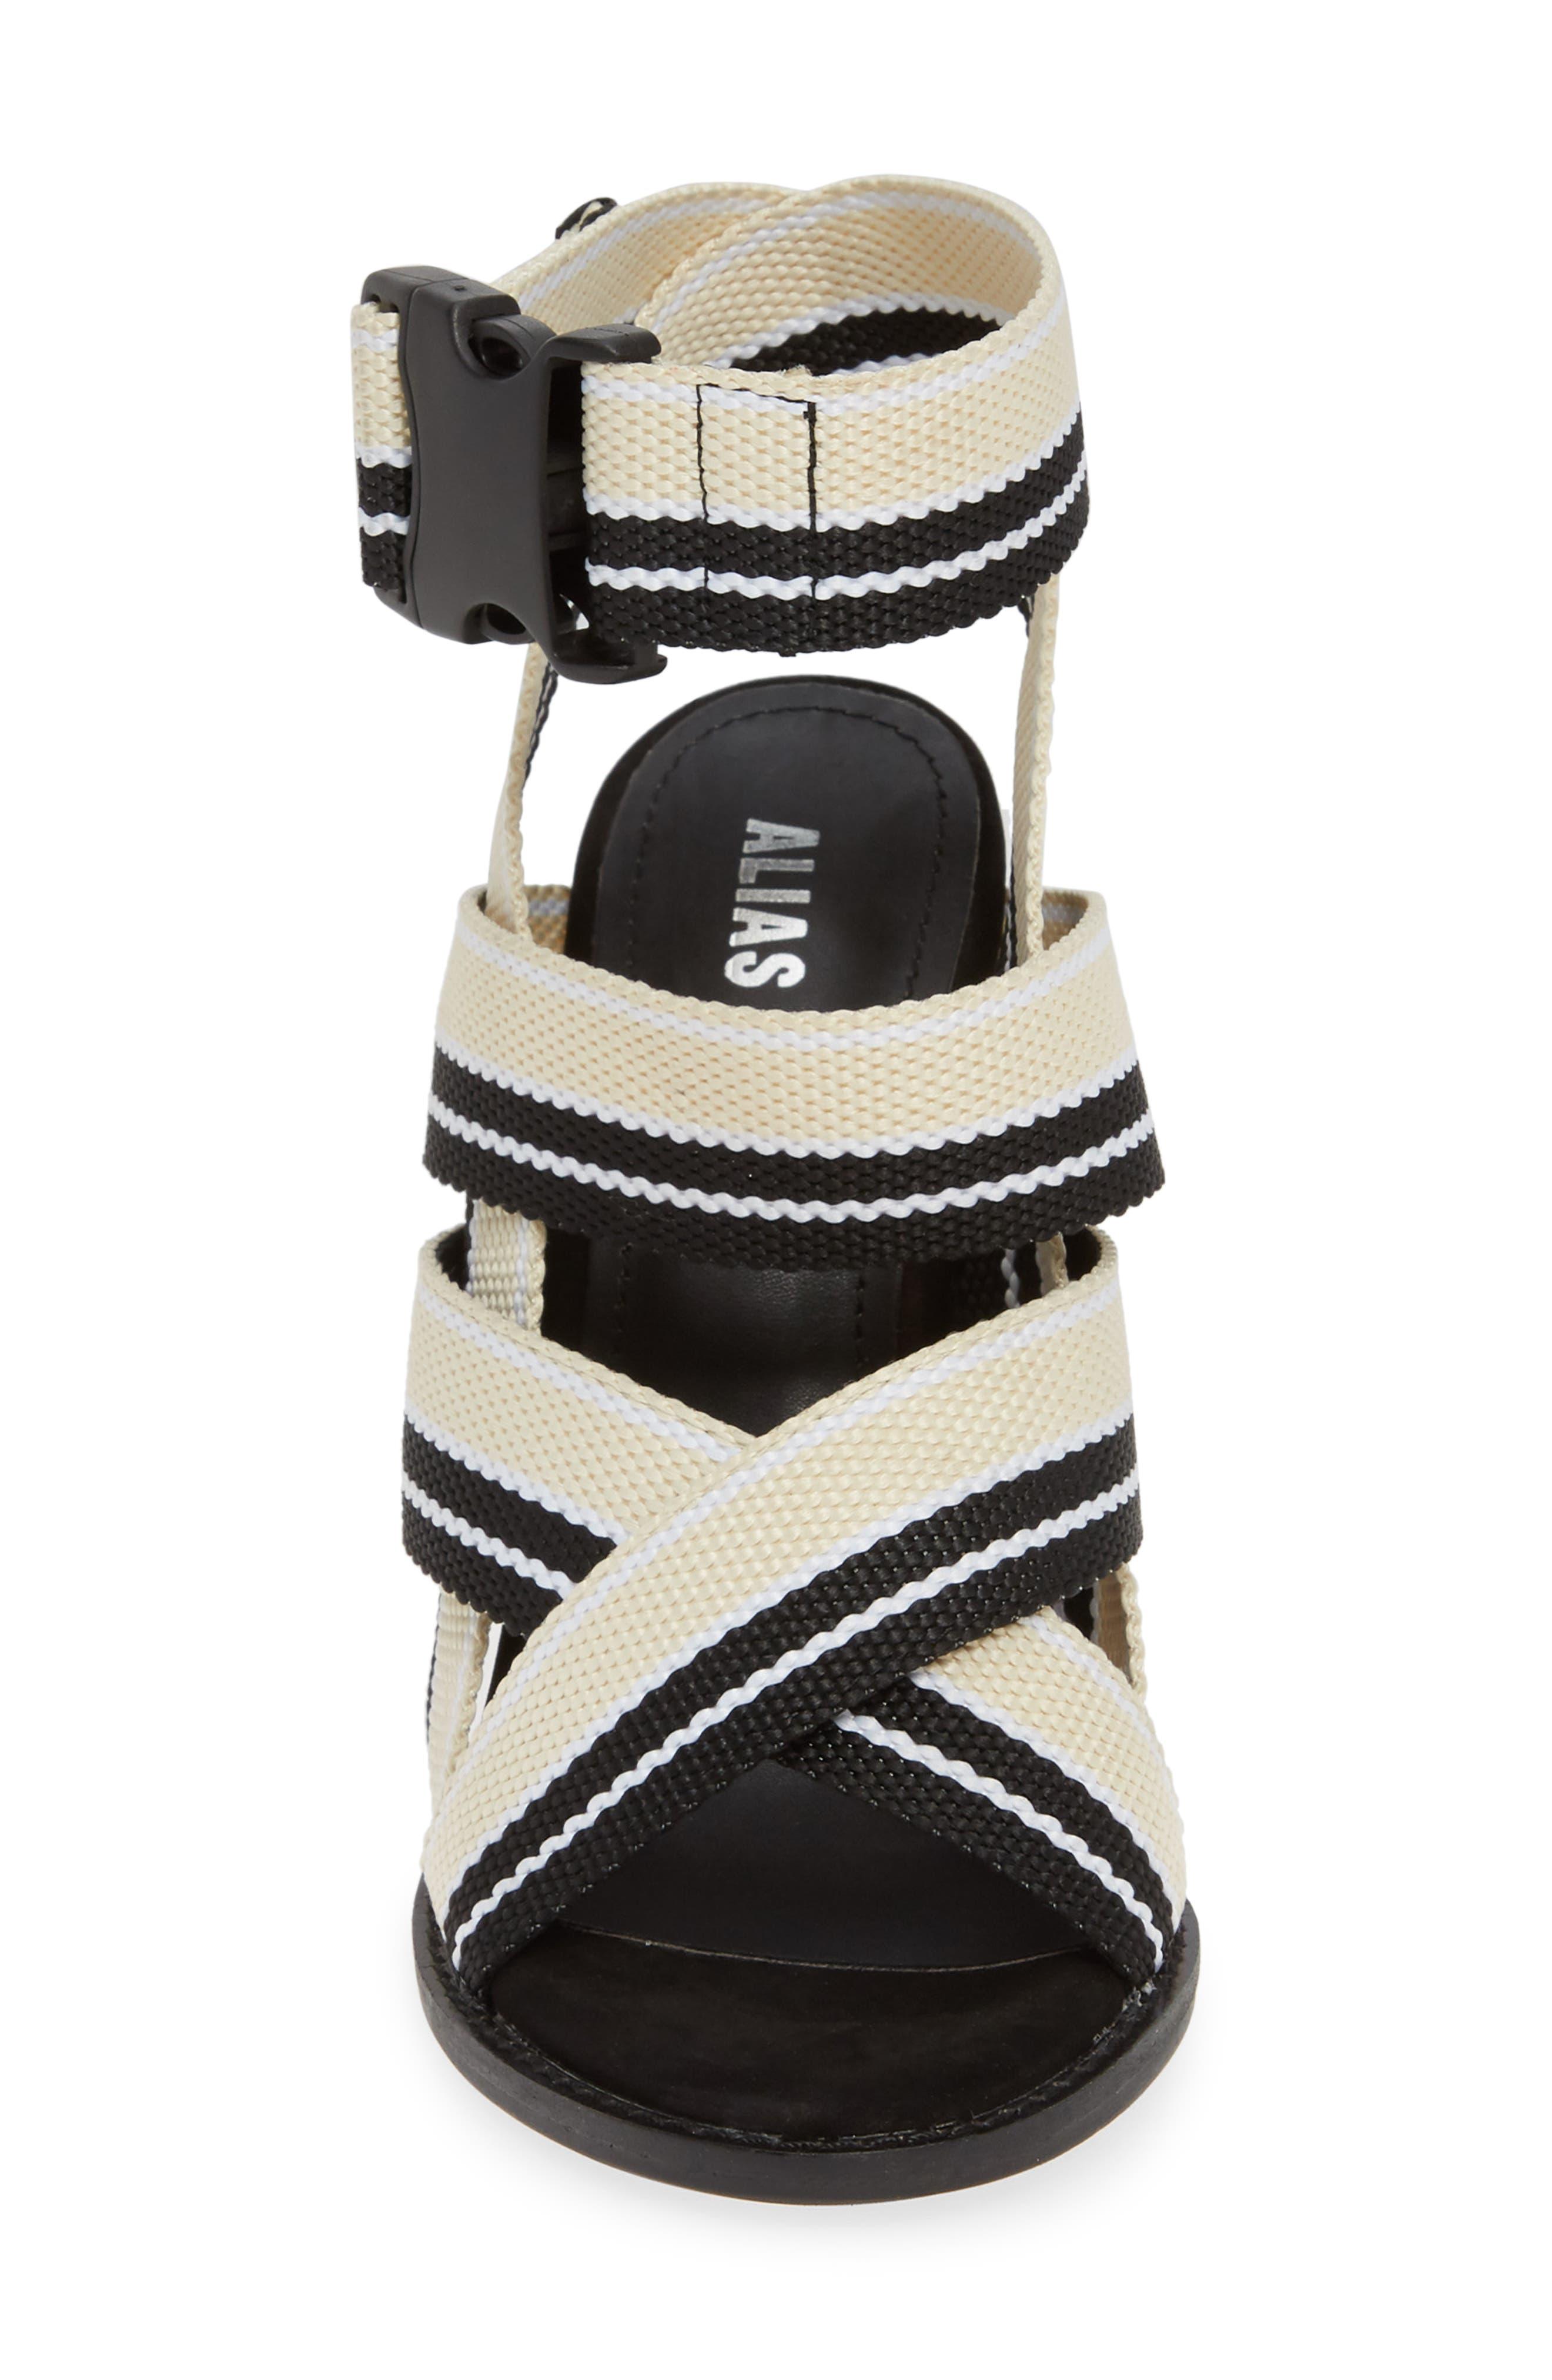 ALIAS MAE, Woven Strappy Sandal, Alternate thumbnail 4, color, NUDE/ BLACK FABRIC